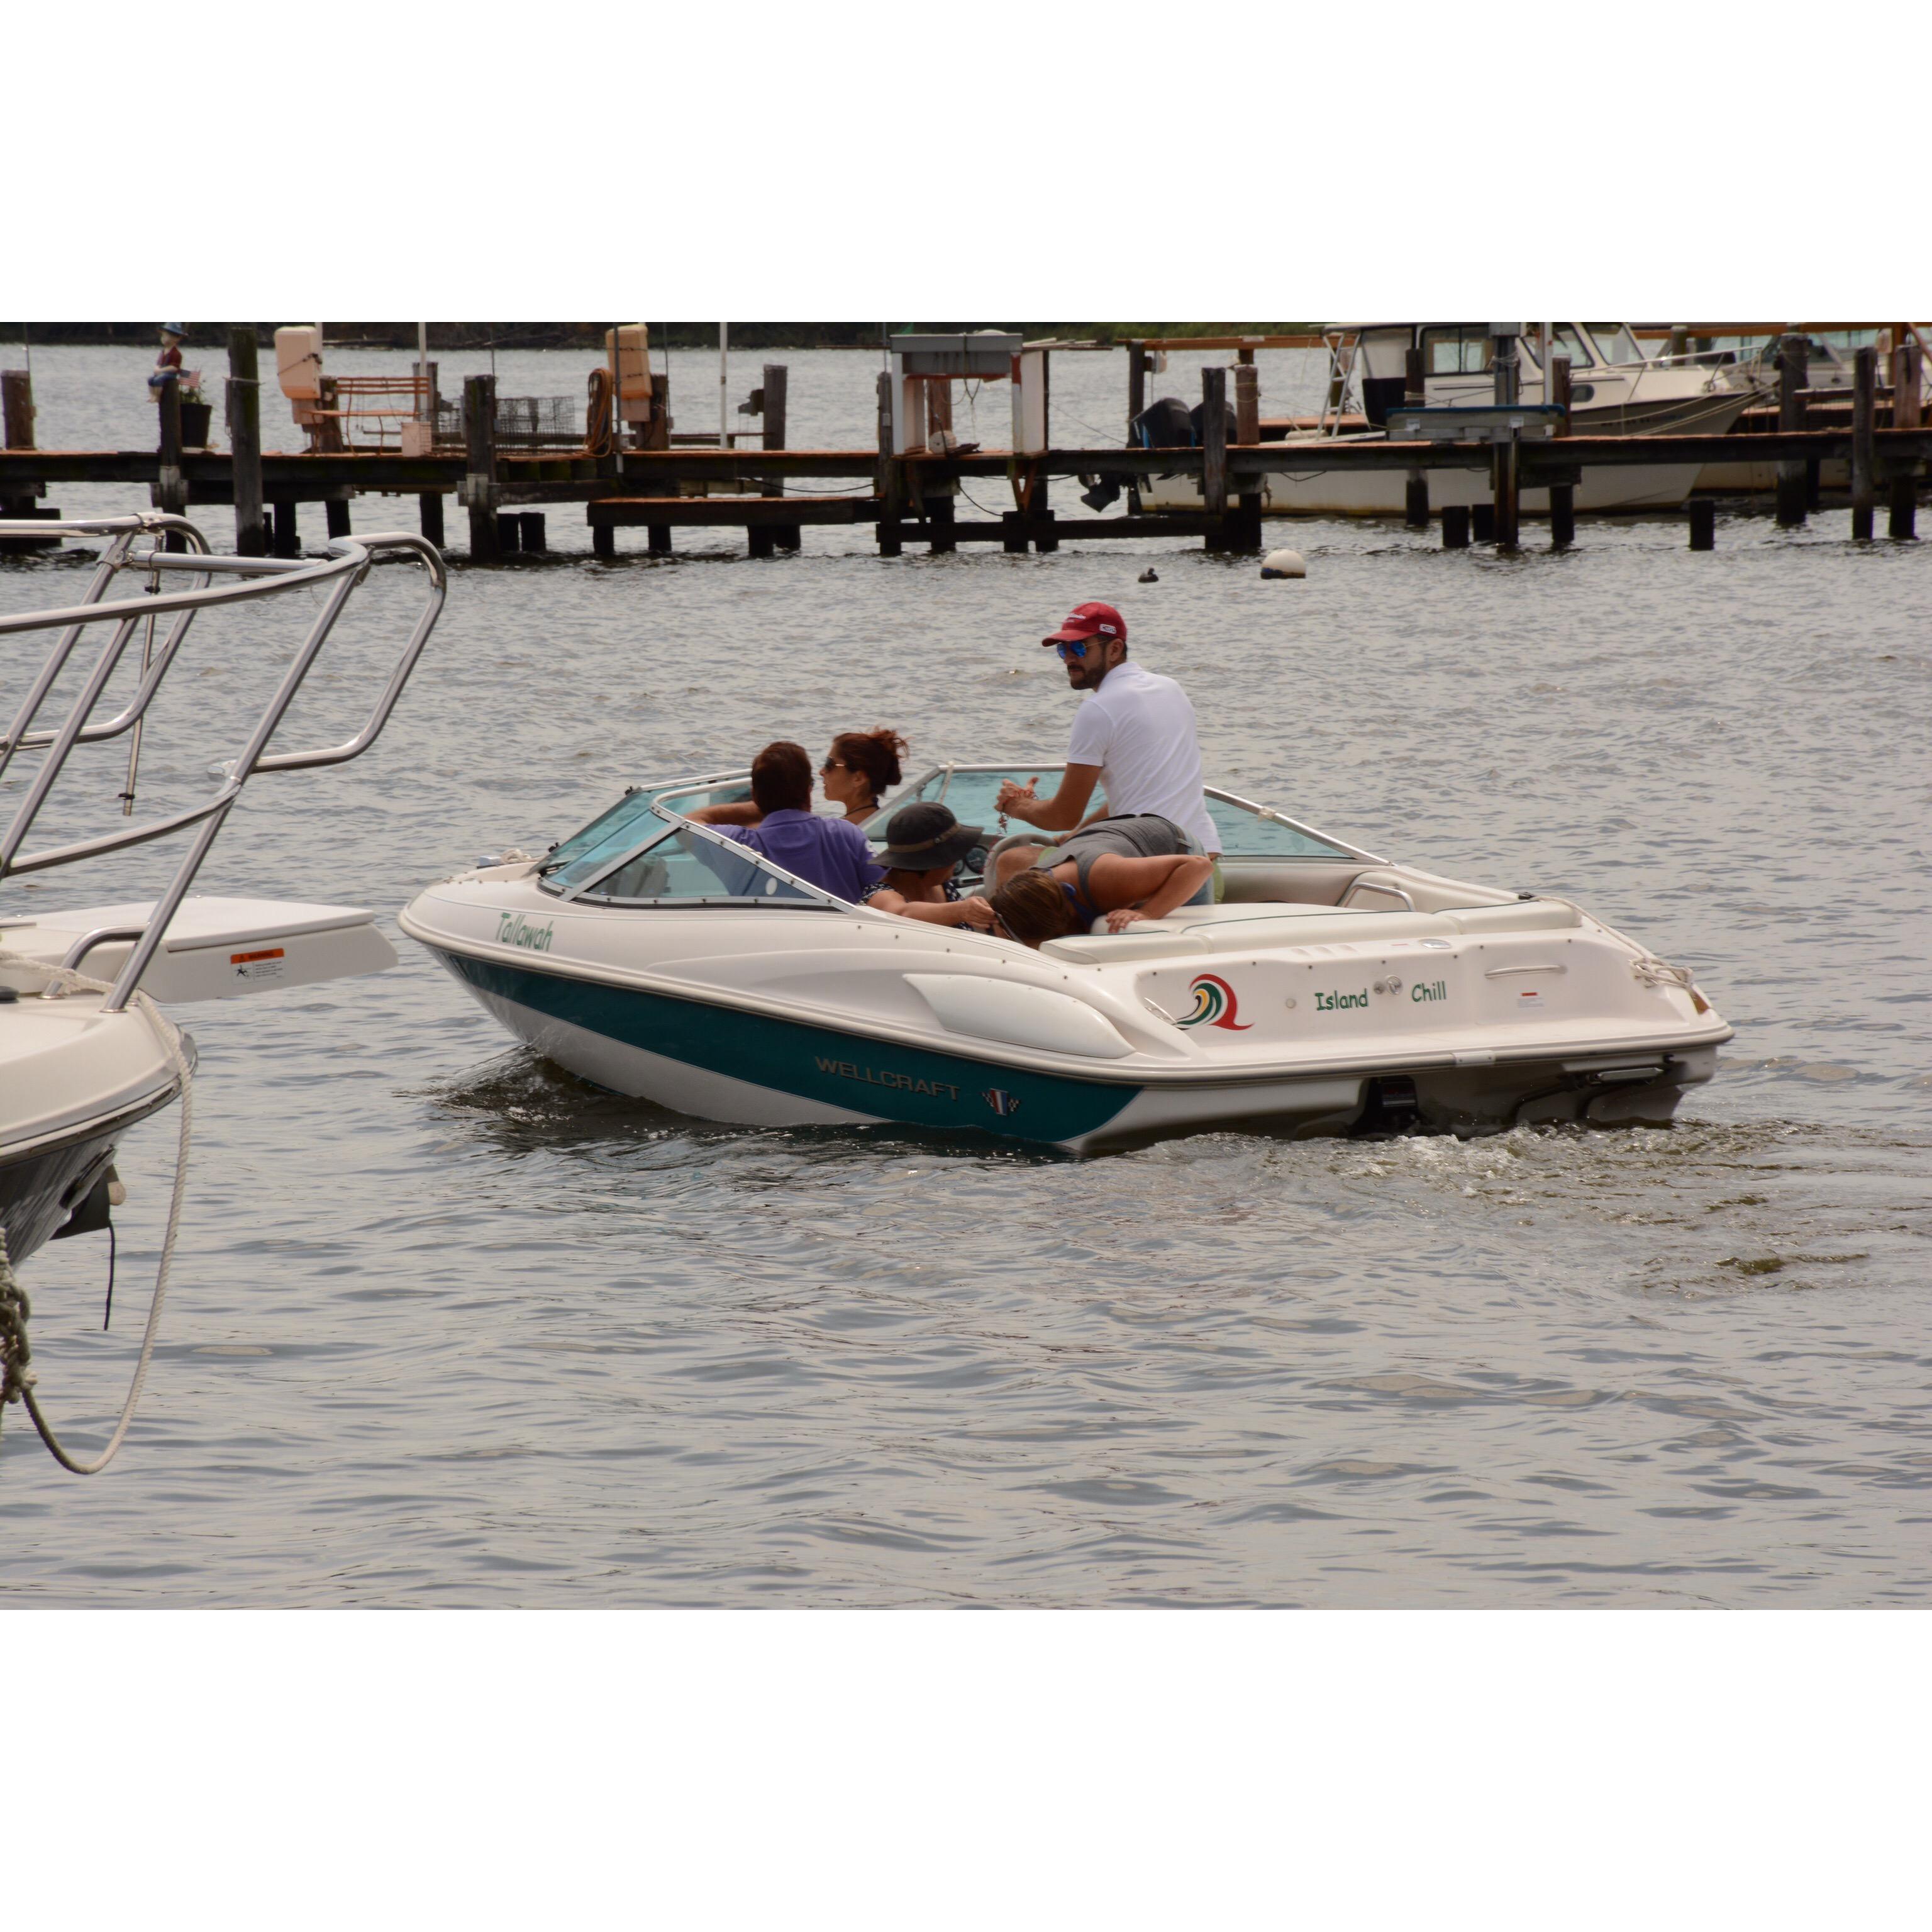 bow-rider bareboat charter Annapolis md Chesapeake bay